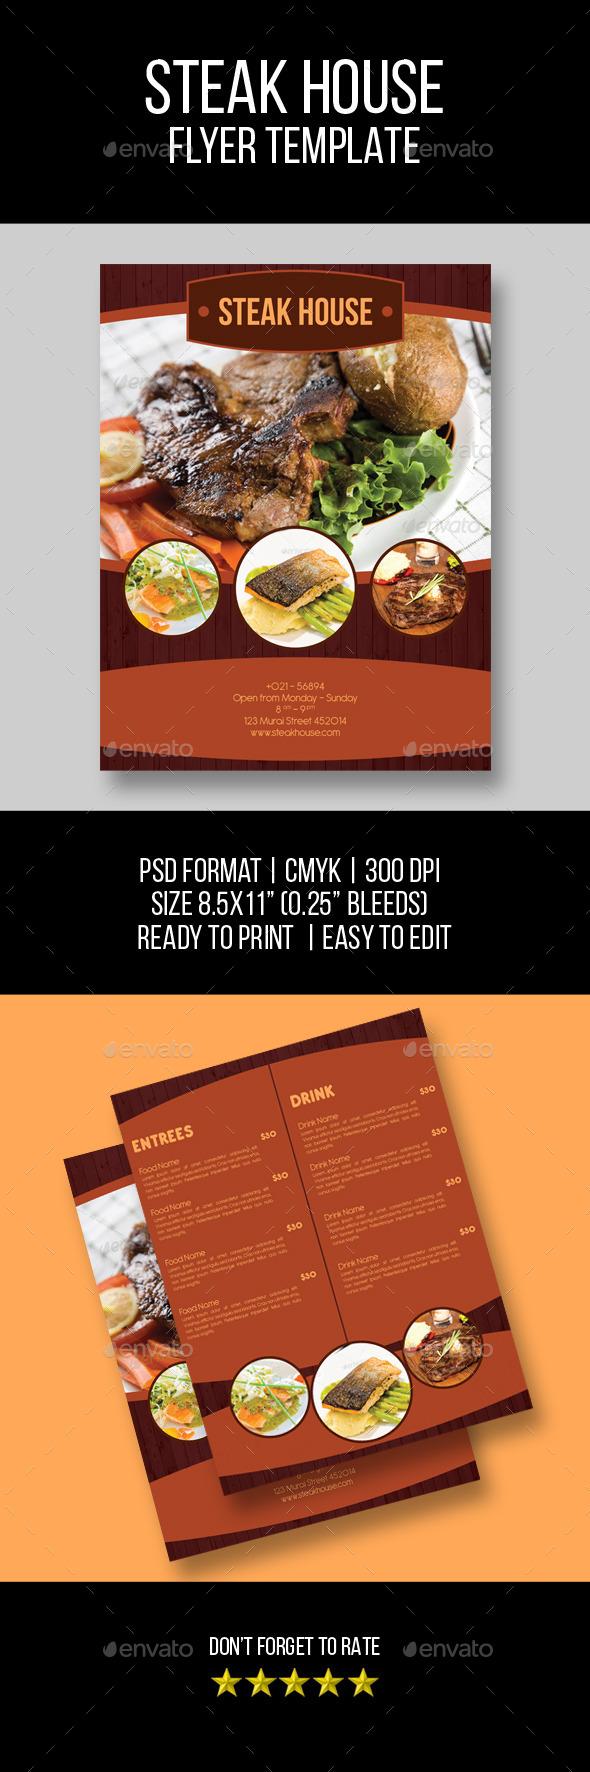 Steak Menu Flyer Template - Food Menus Print Templates